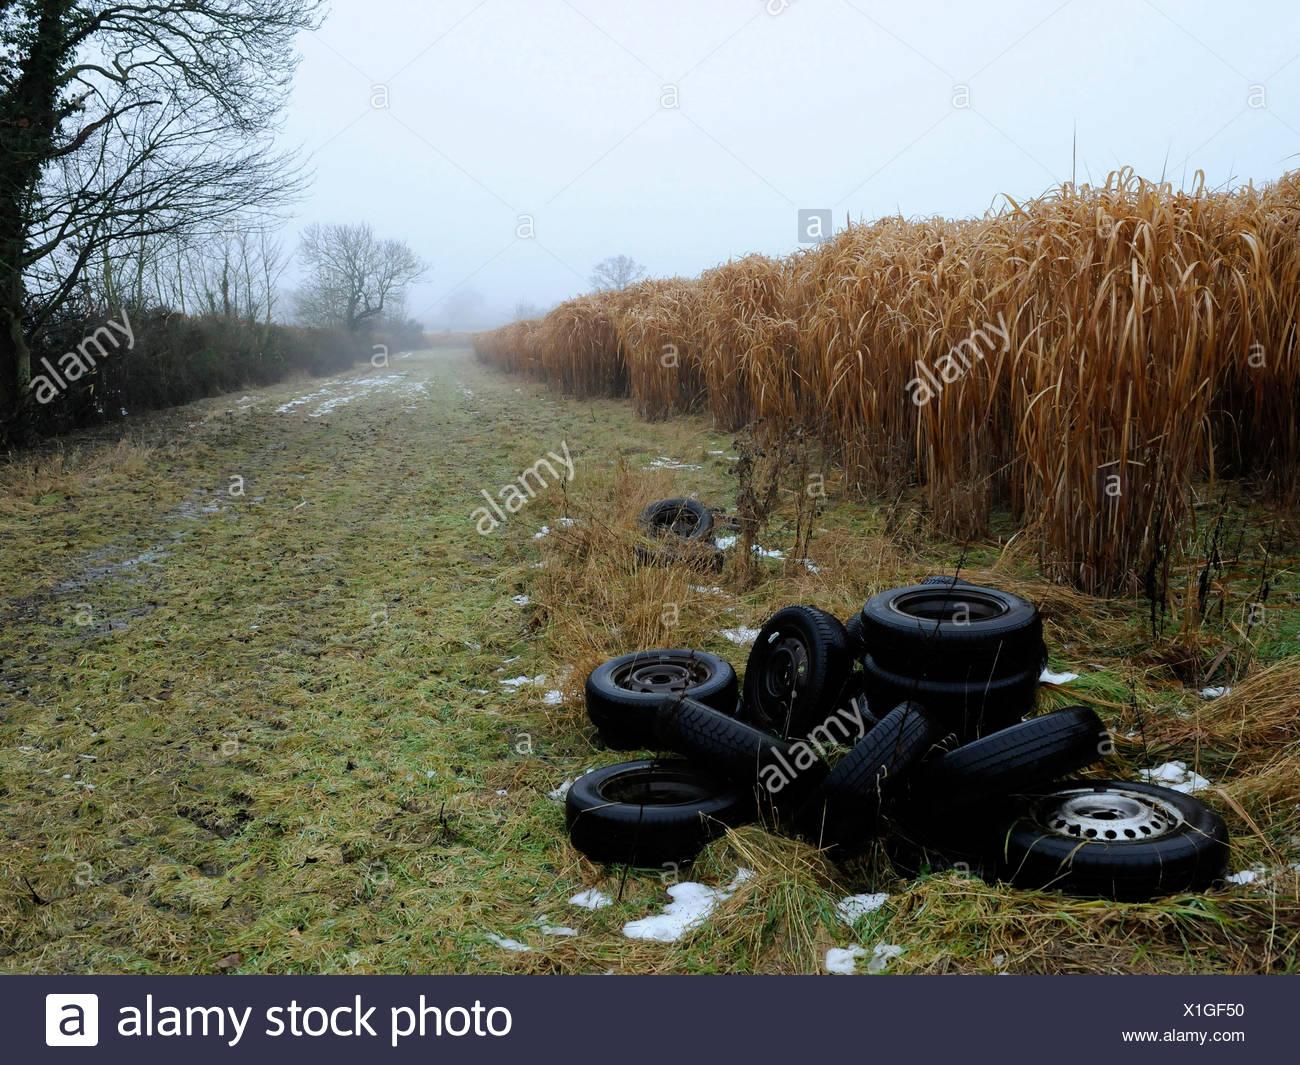 Car tyres illegally dumped on farmland. - Stock Image